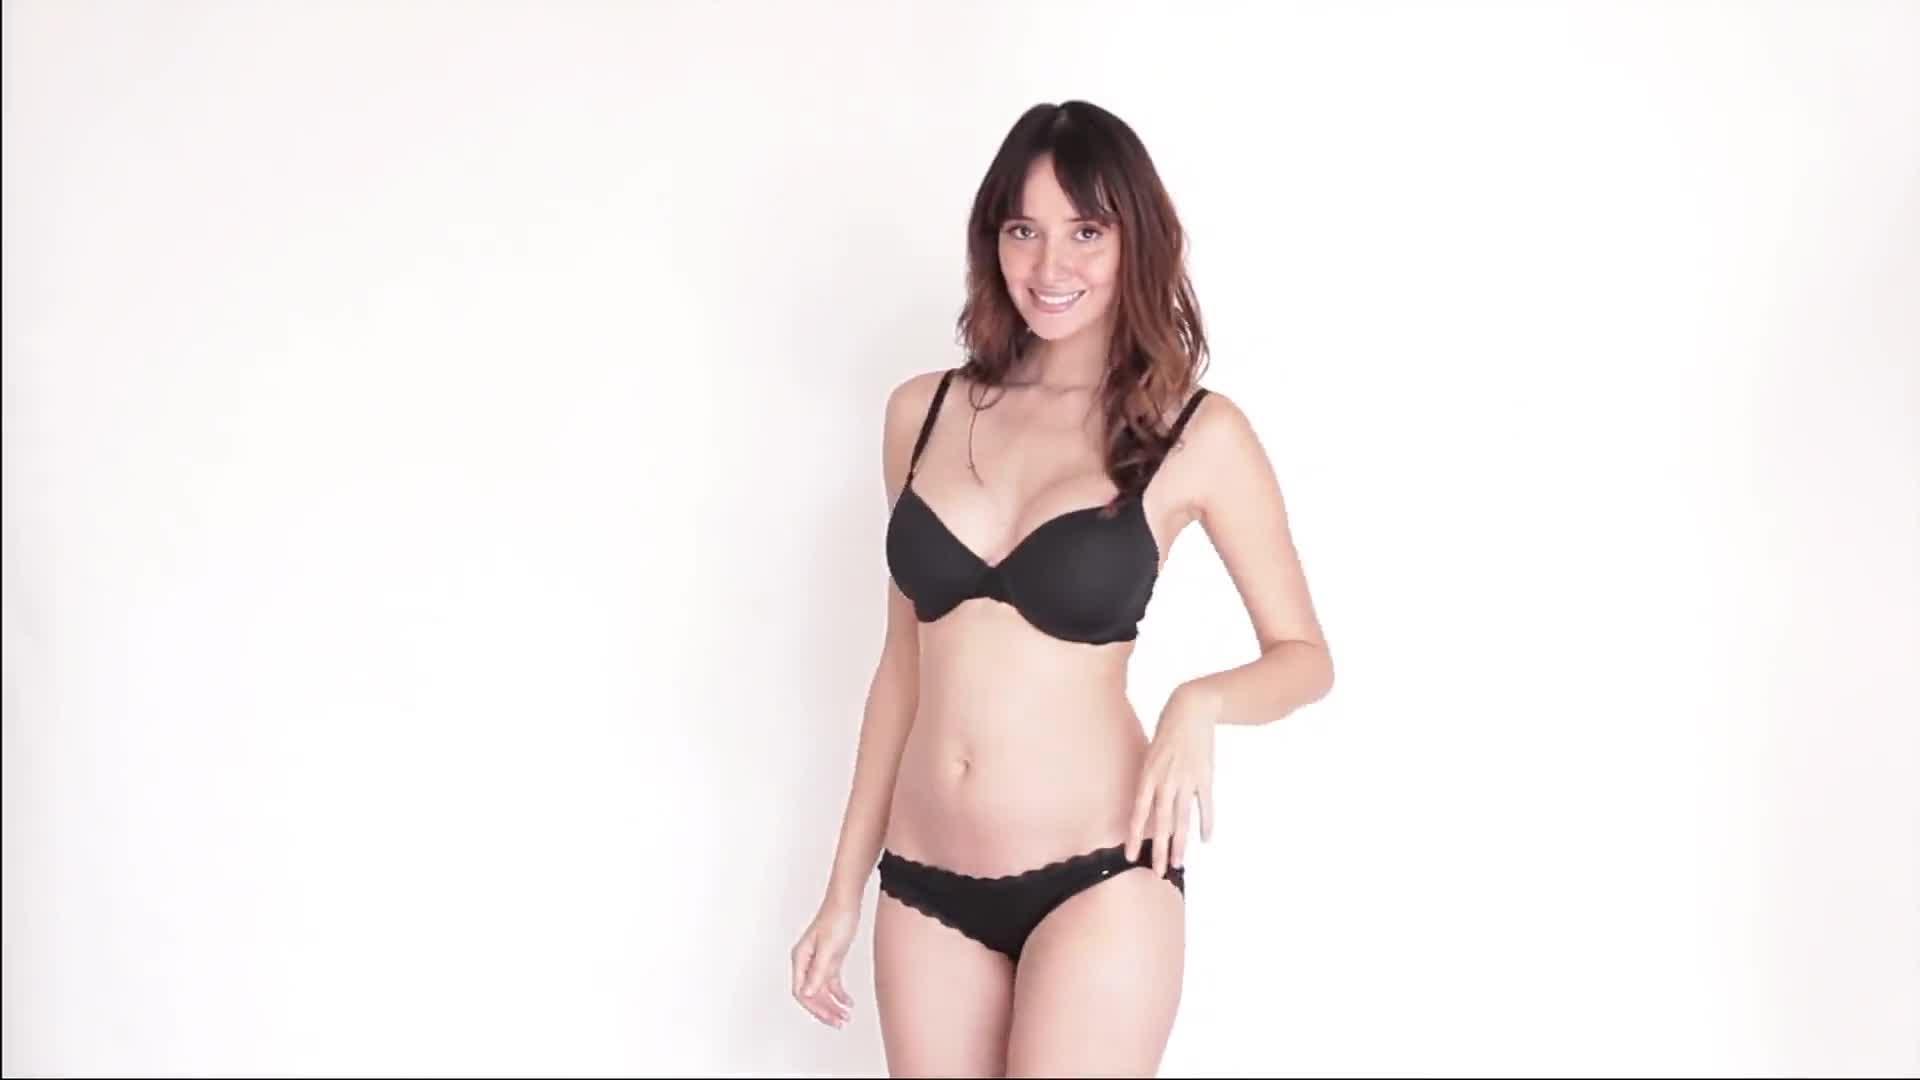 Sara Malakul Lane sexy photo shoot in lingerie